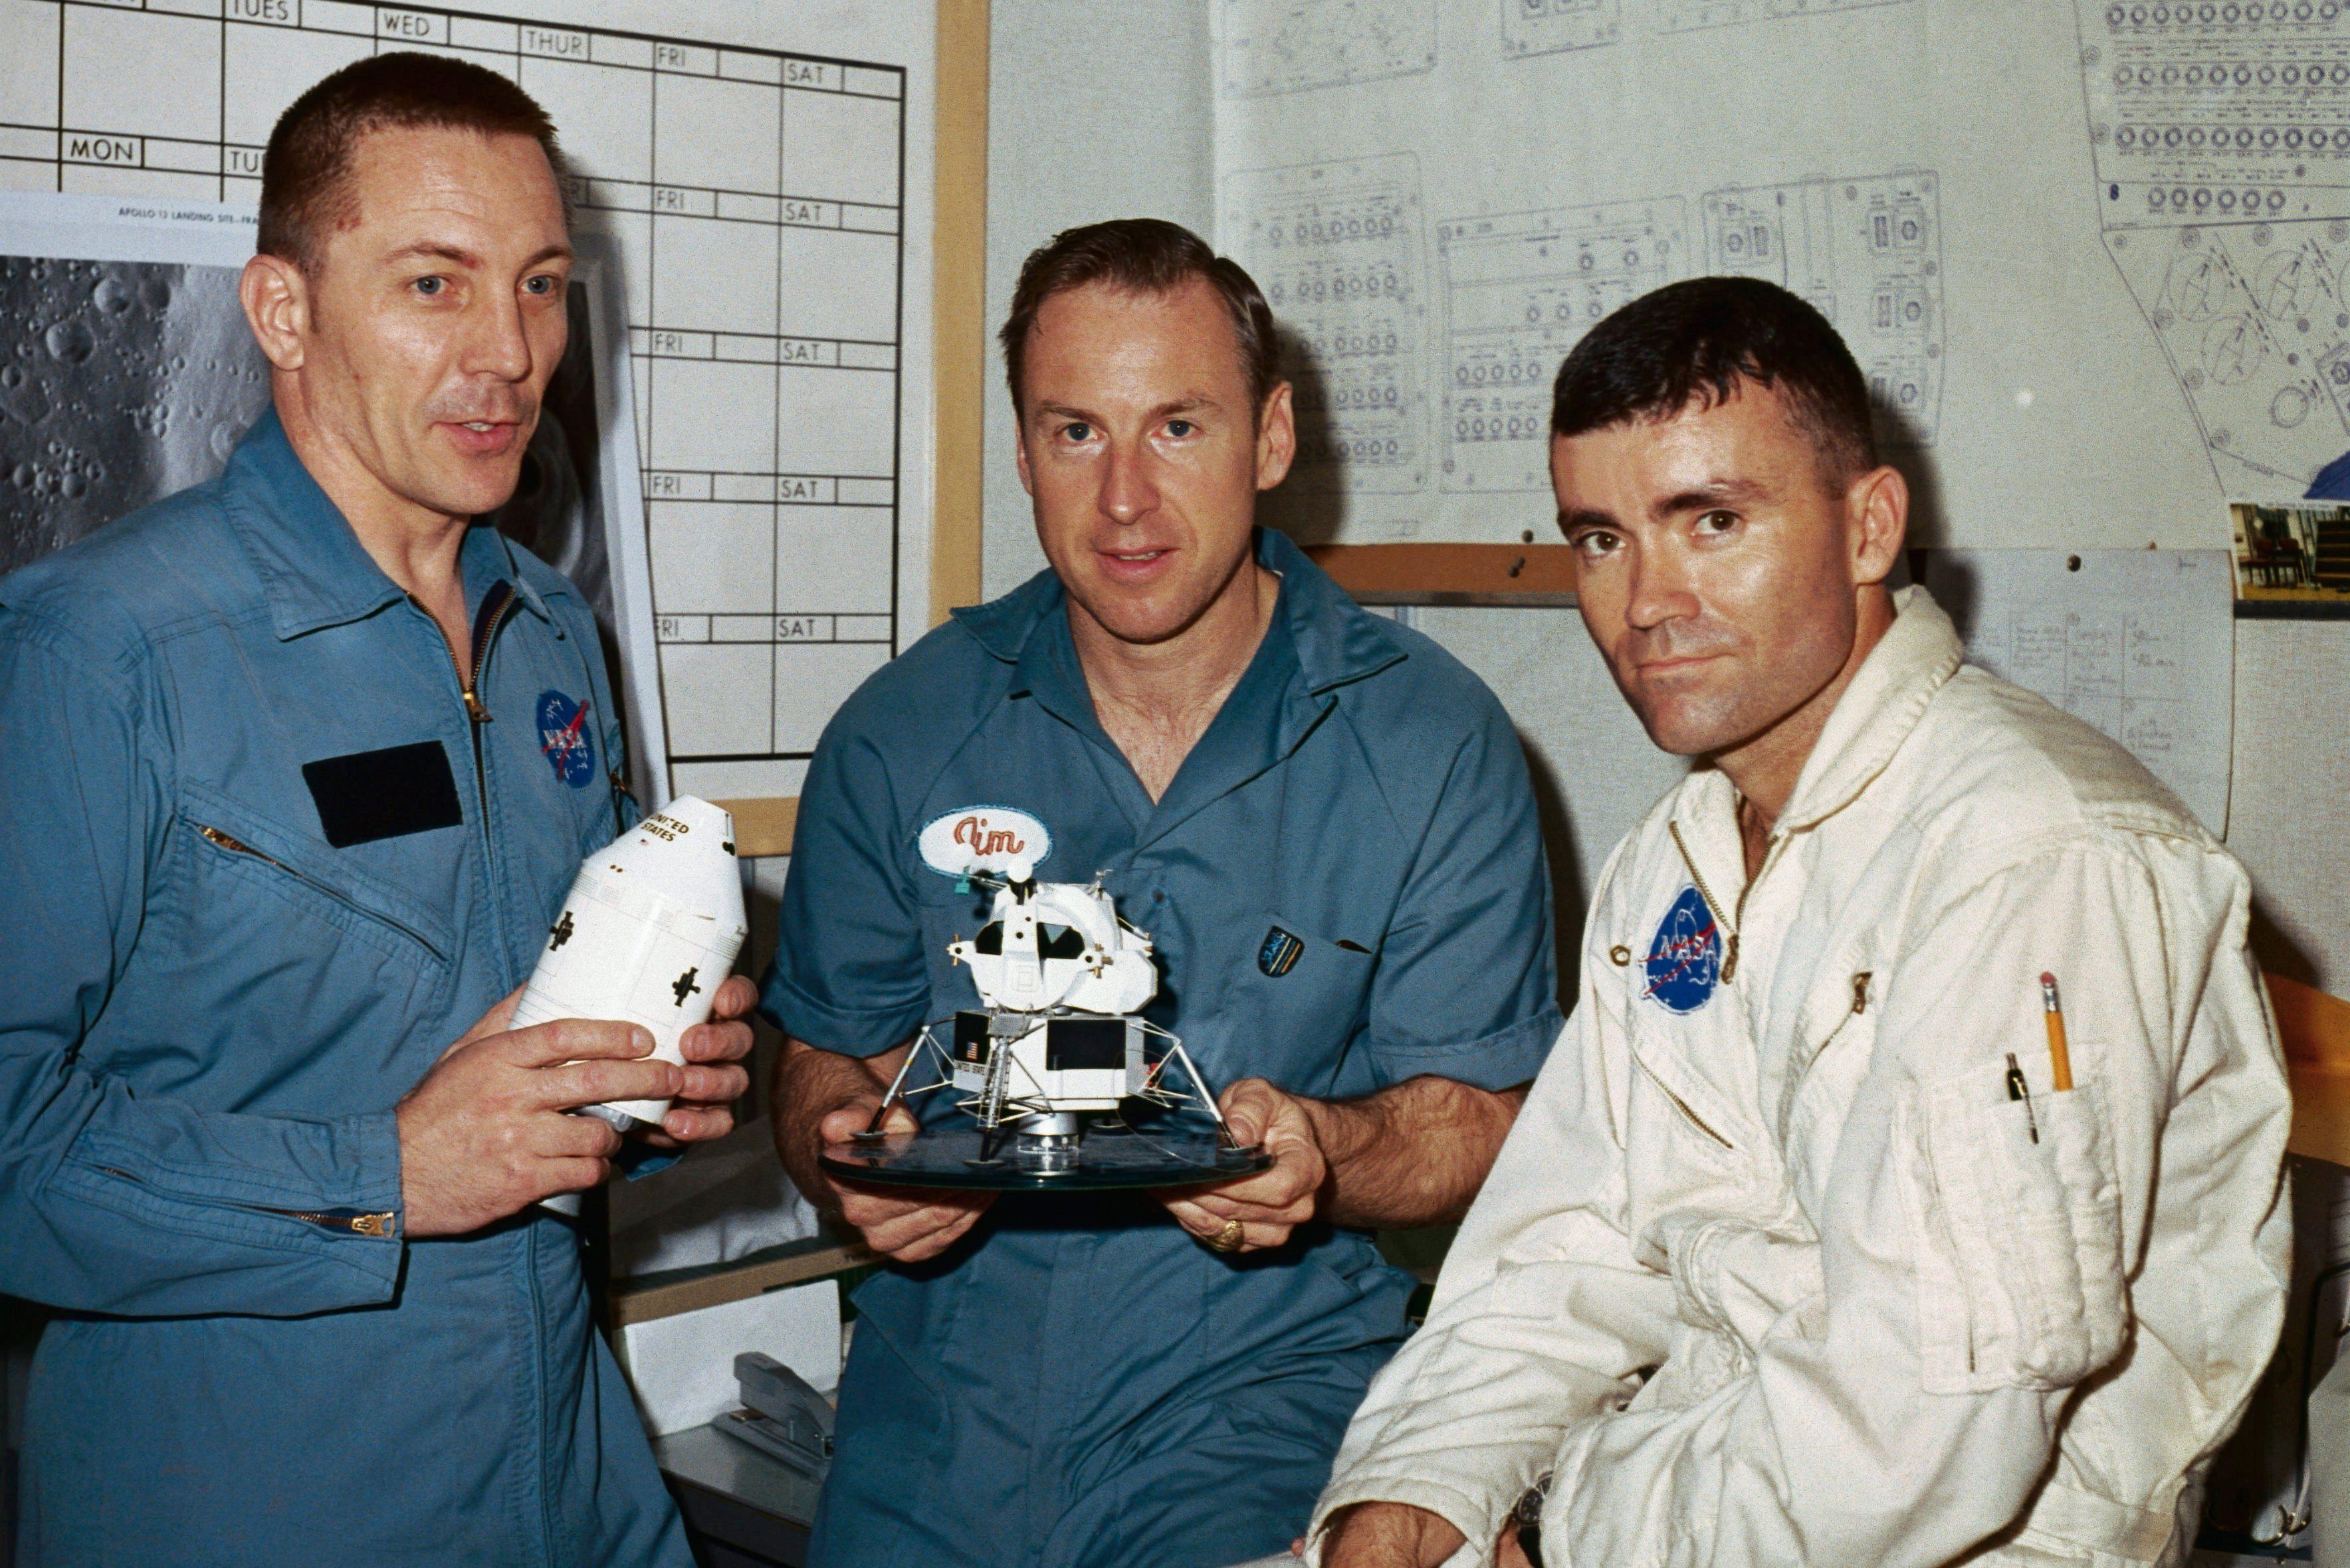 Apollo 13 Astronauts at a Briefing